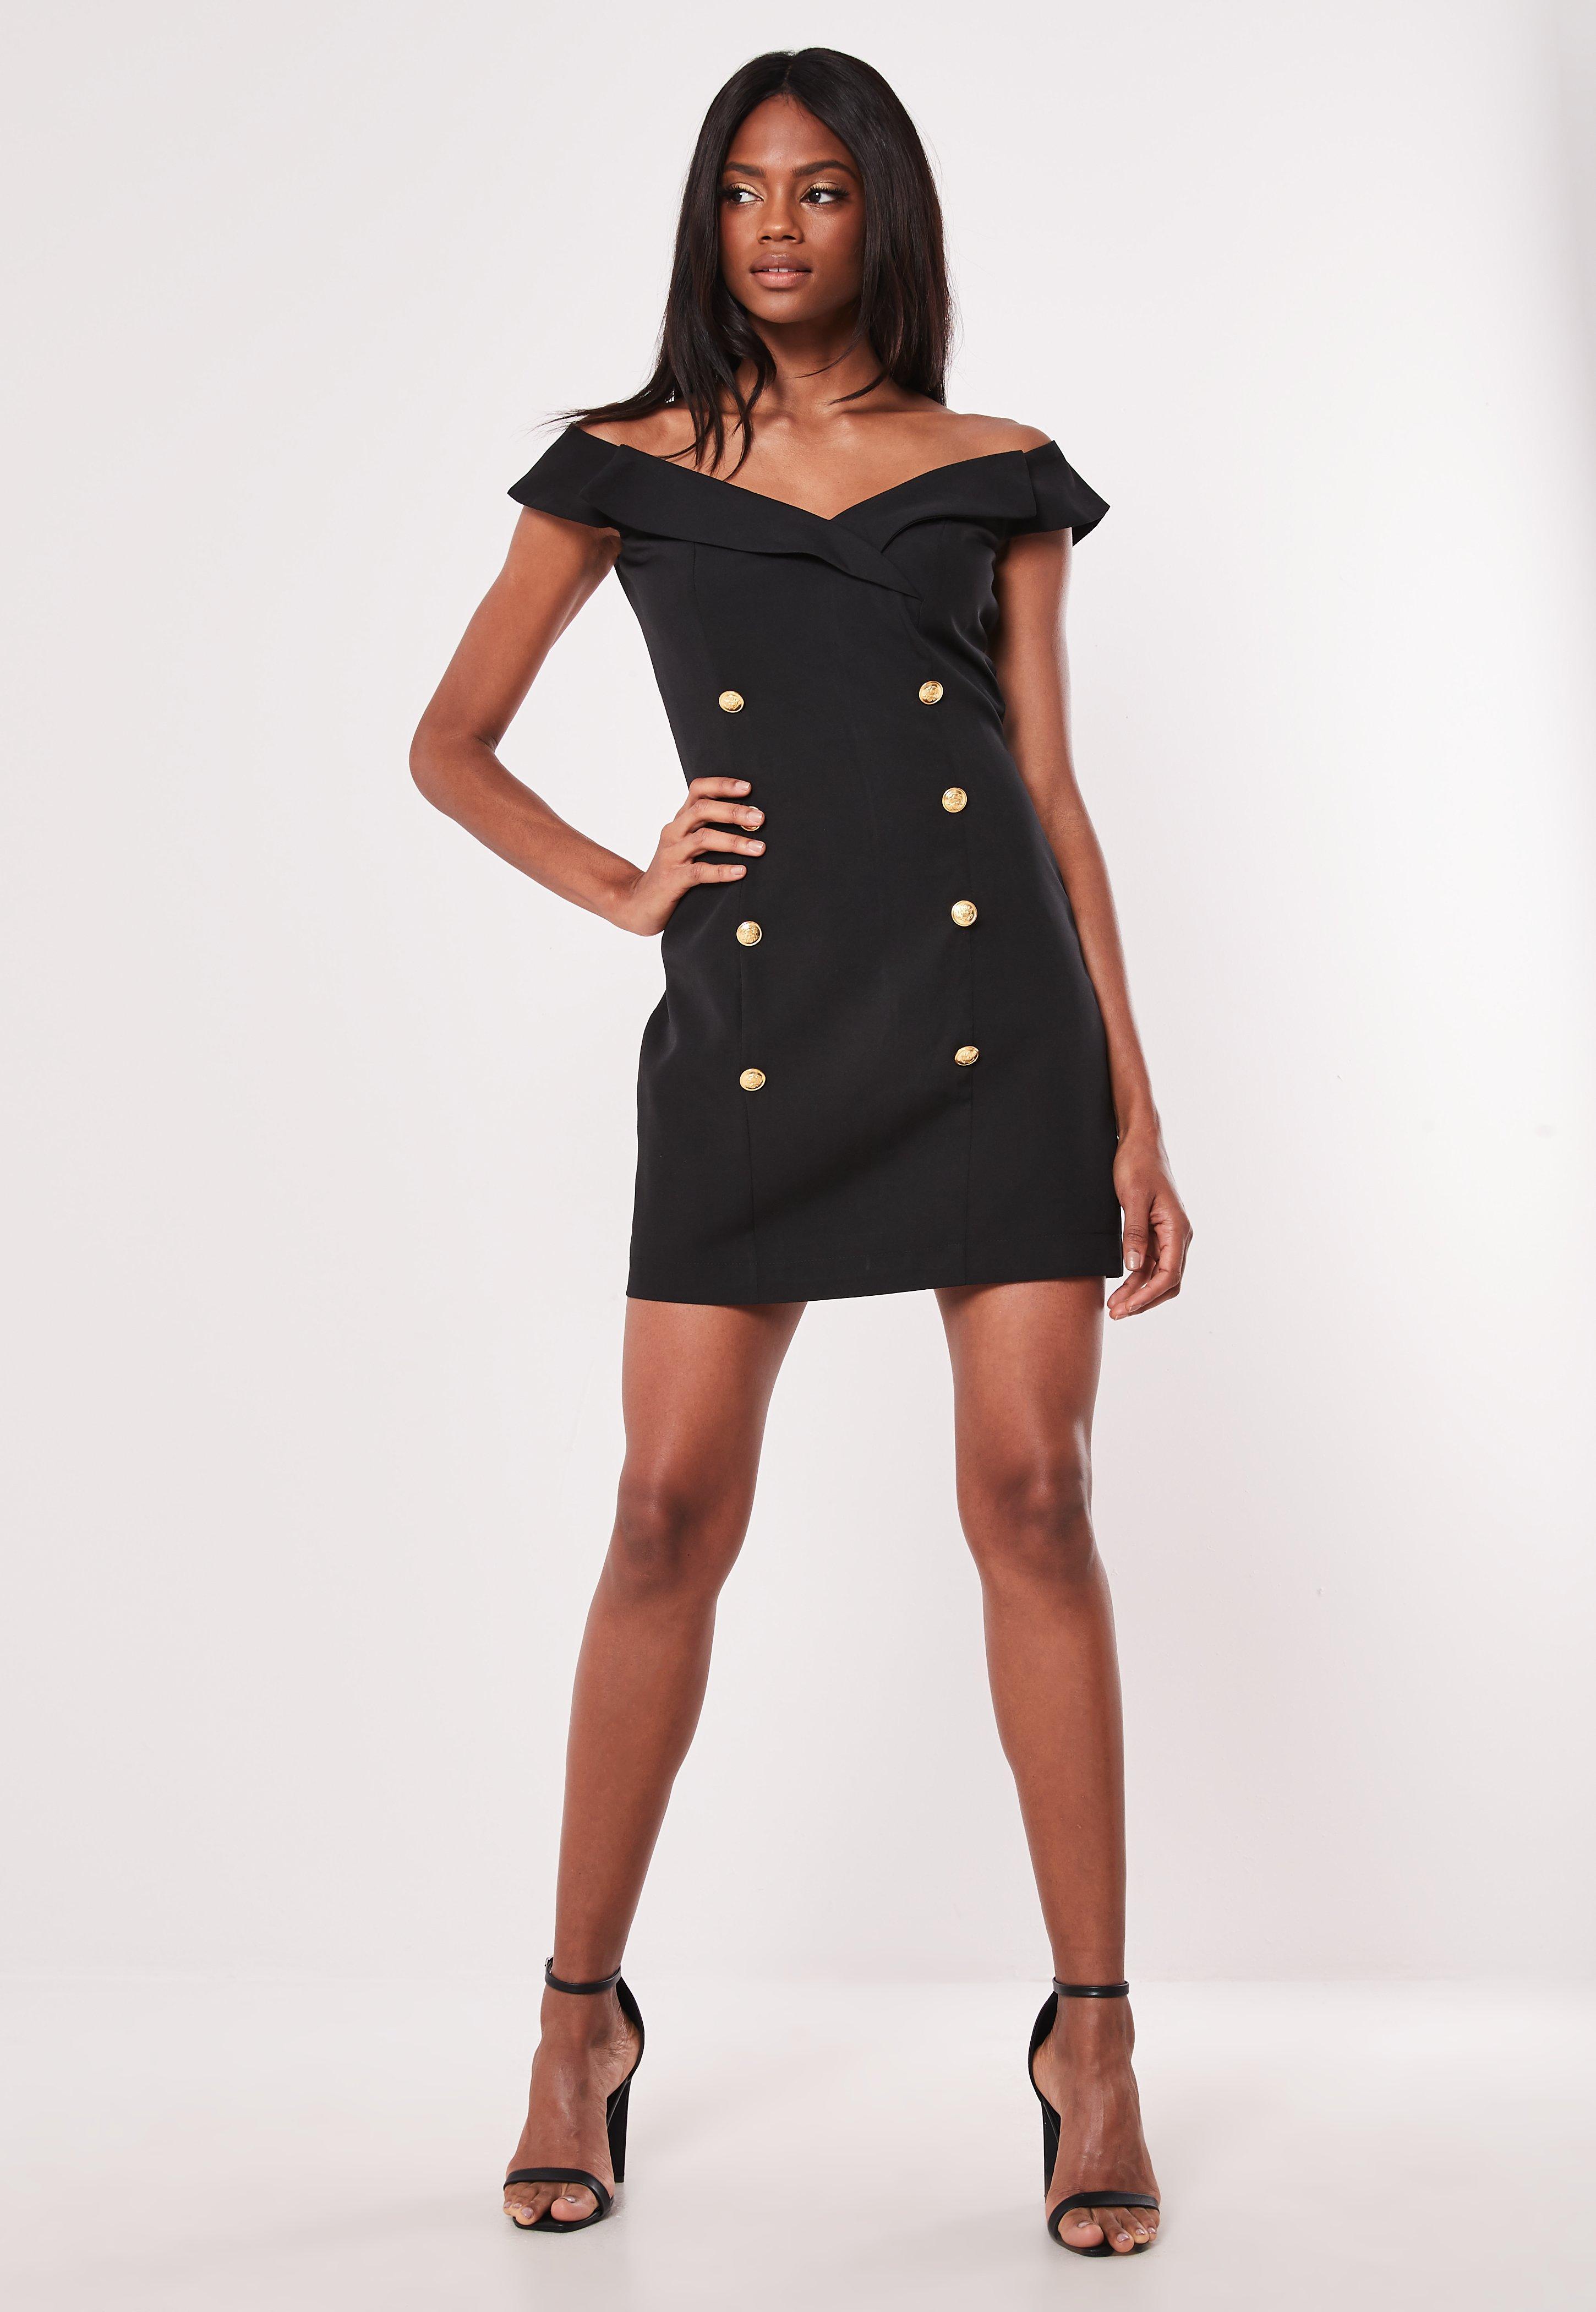 0cb5db5a81 Blazer Dresses | Women's Tux Dresses - Missguided